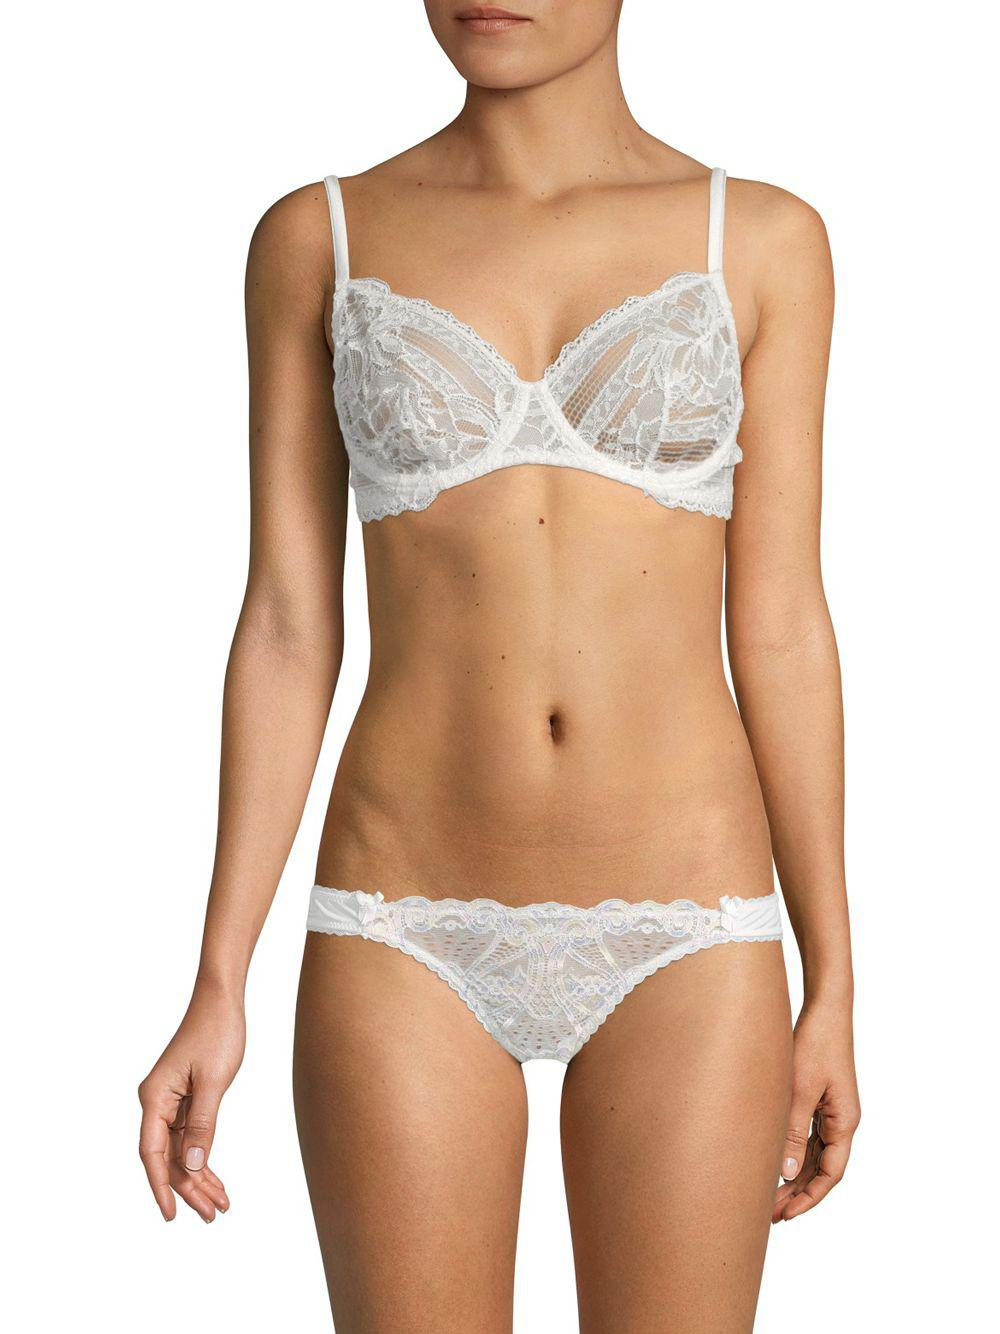 9976007551 Lyst - Addiction Nouvelle Lingerie Comfort Lace Bra in White